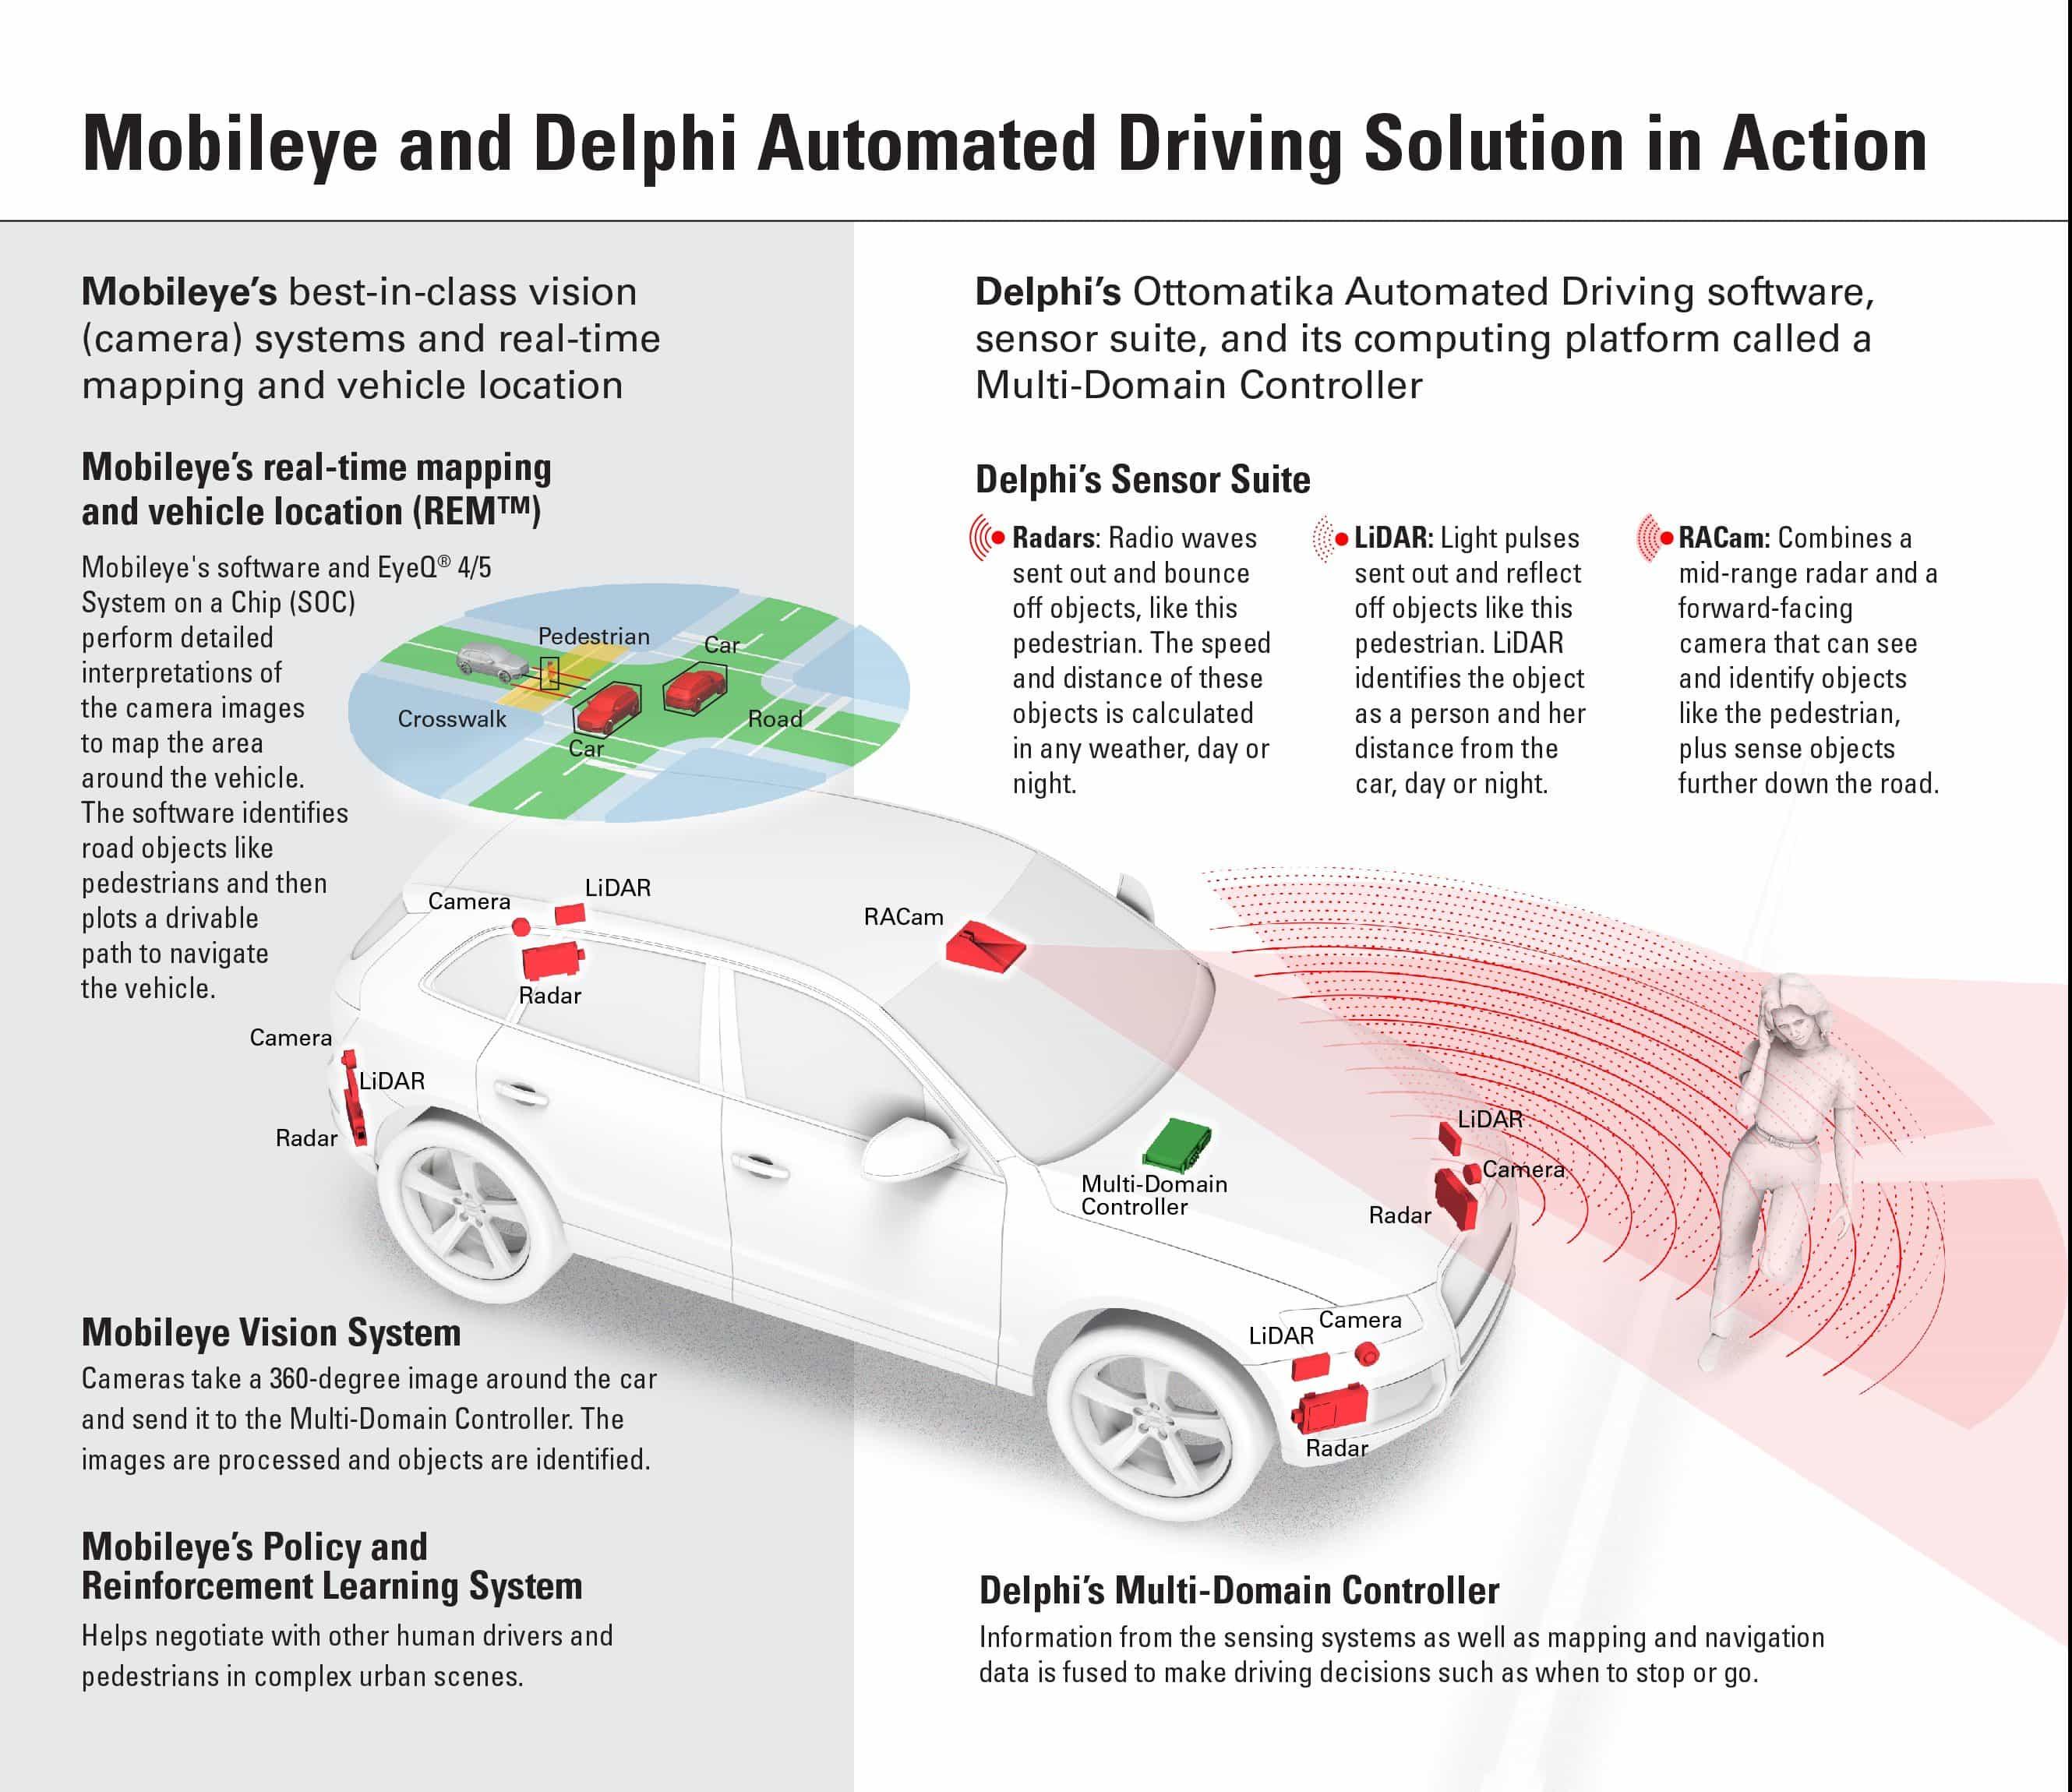 delphi-mobileye-infographic-final